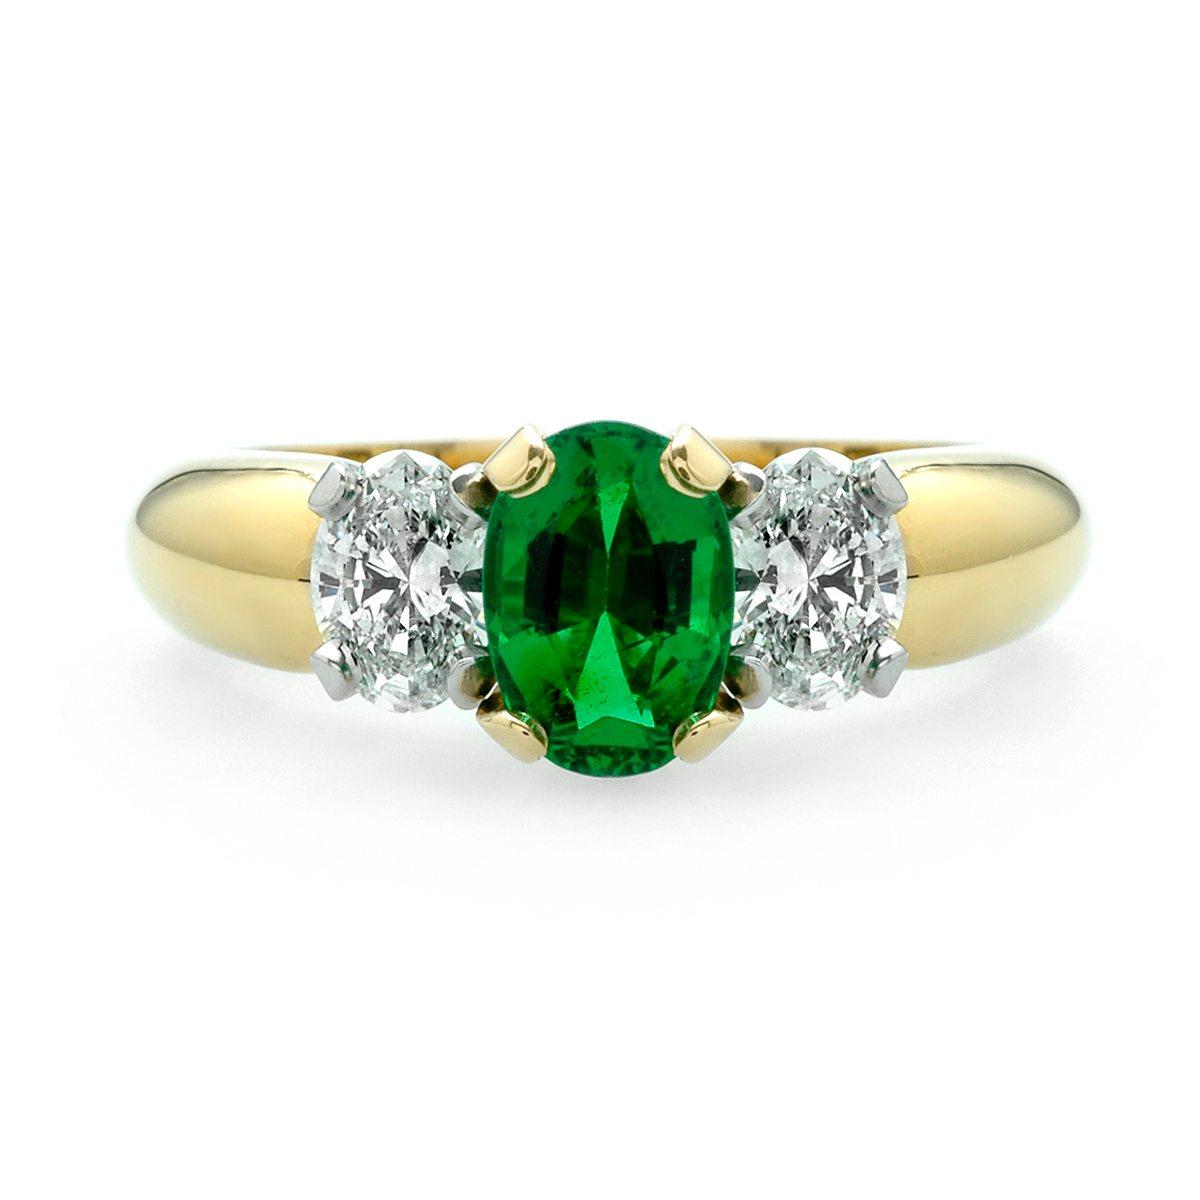 Emerald And Diamond Oval Three Stone Ring JM Edwards Jewelry